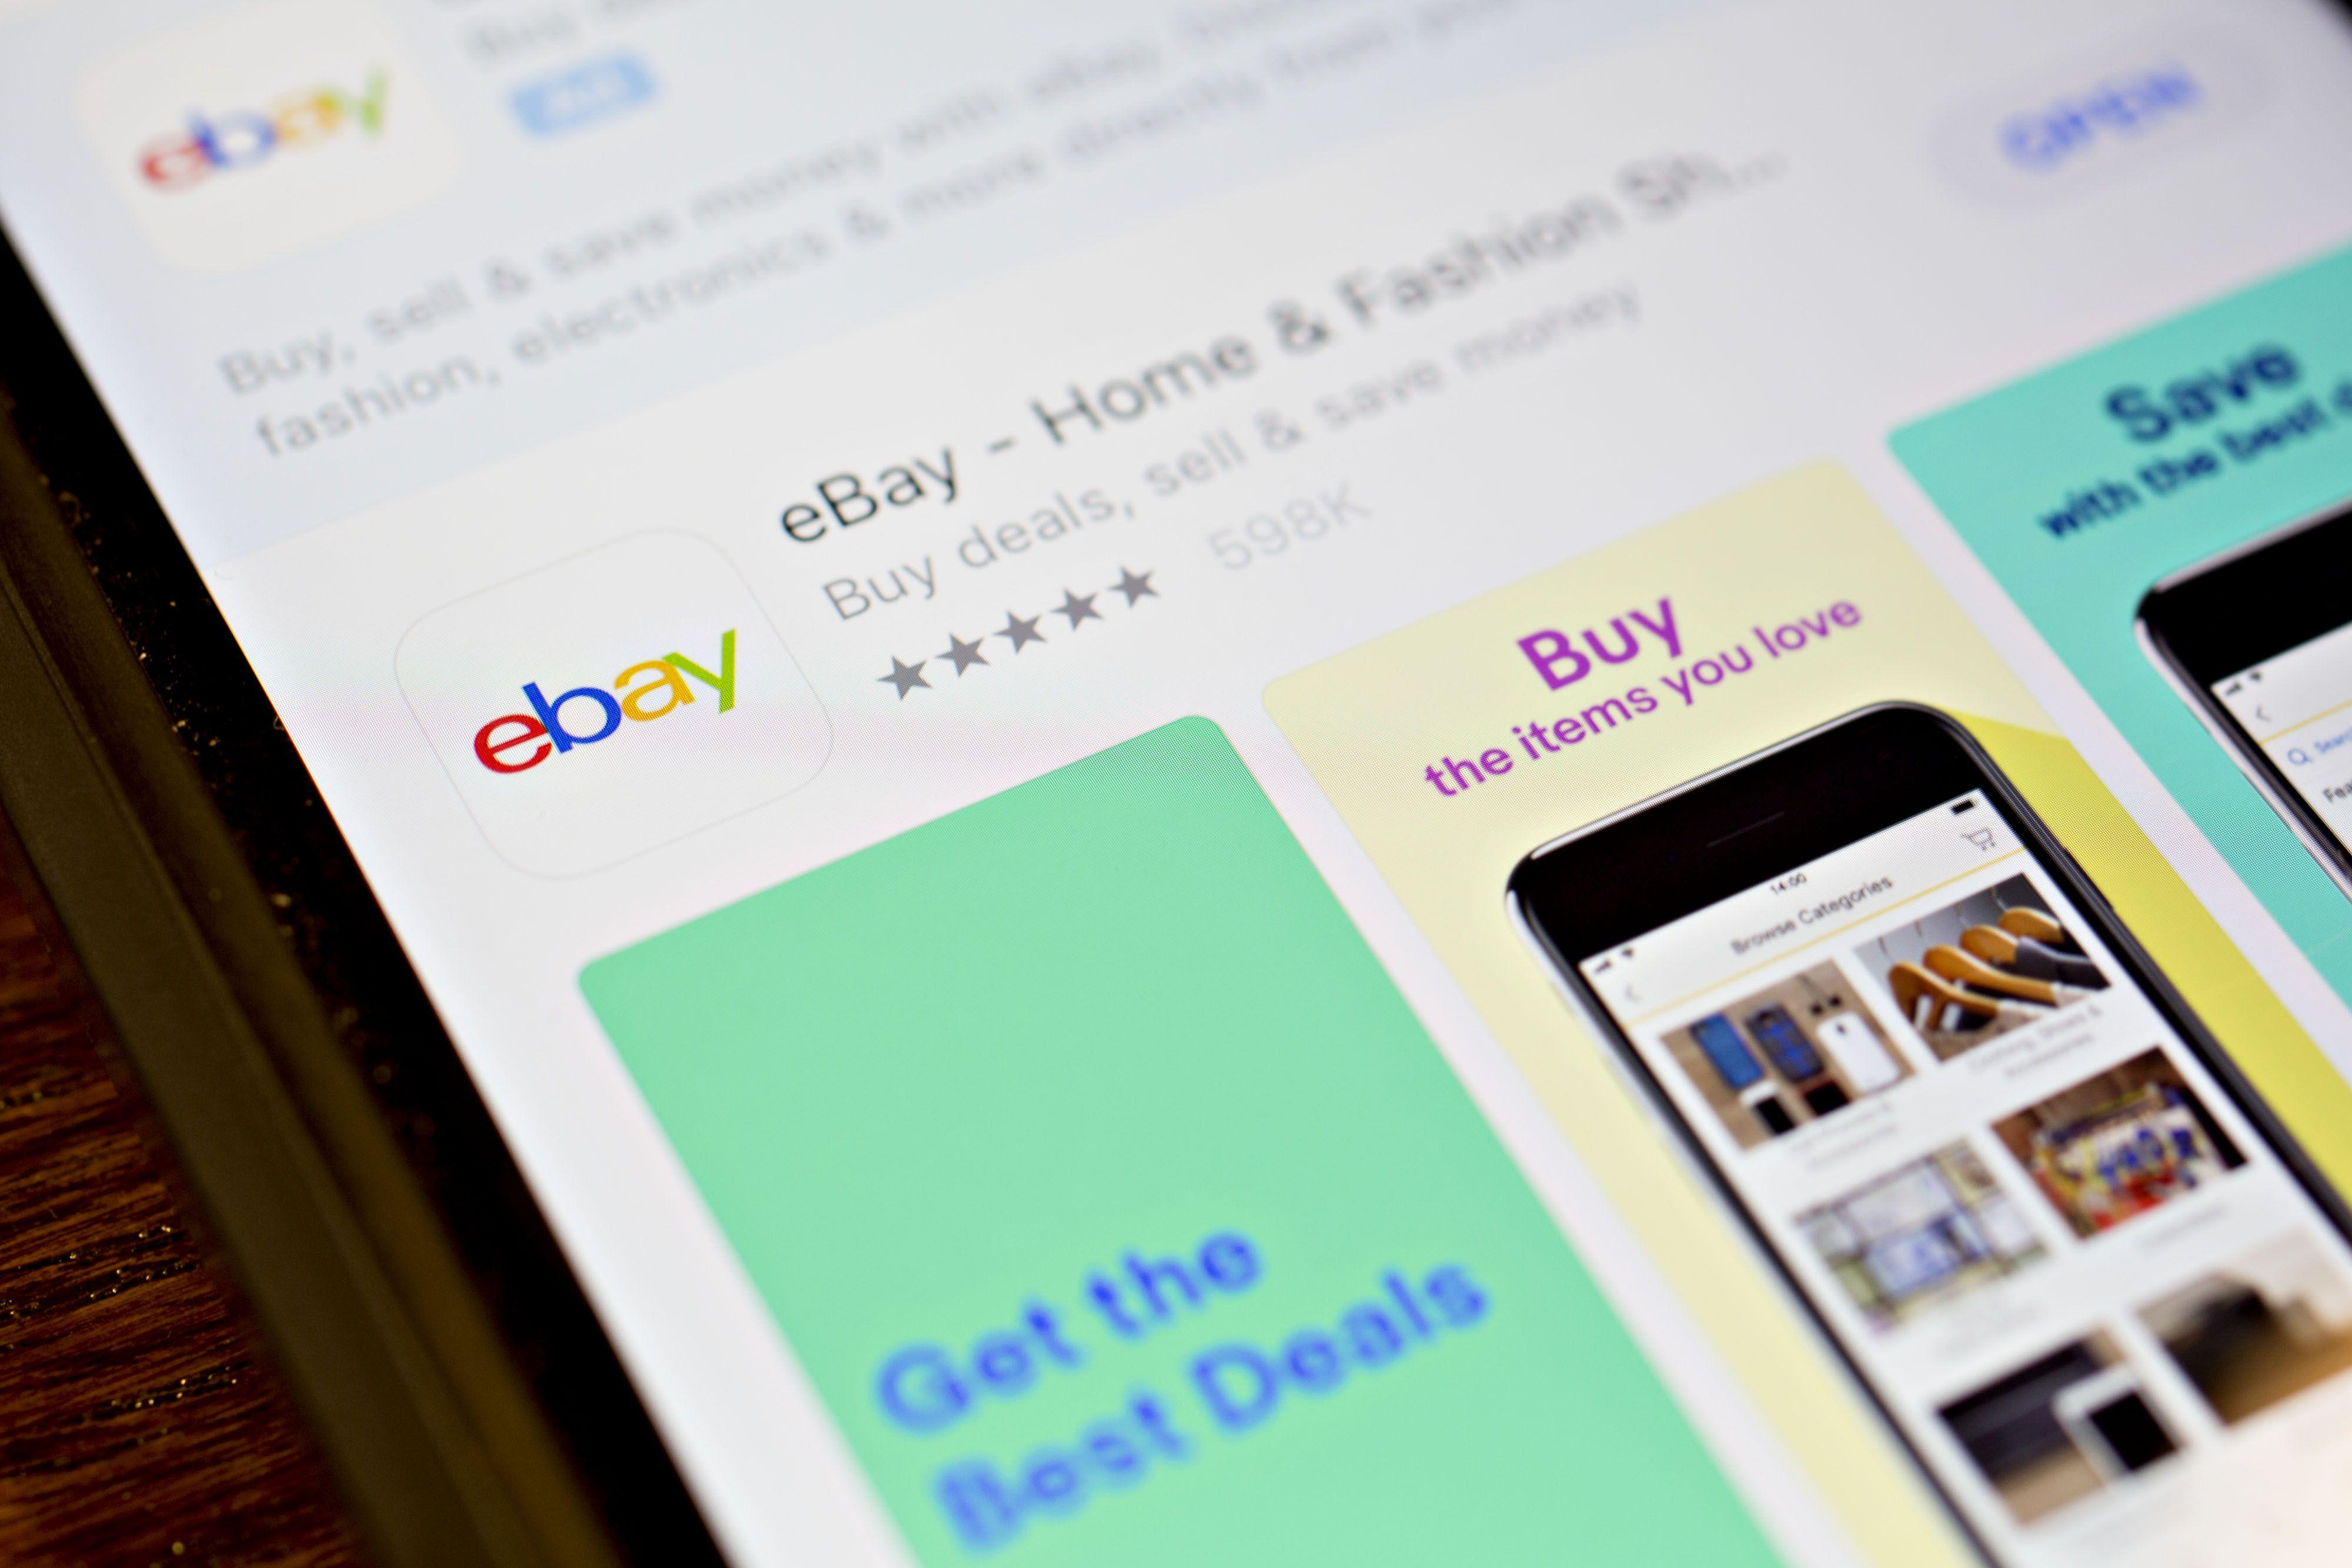 Ebay Profit Beats Analysts Estimates Company Mulls Asset Sales